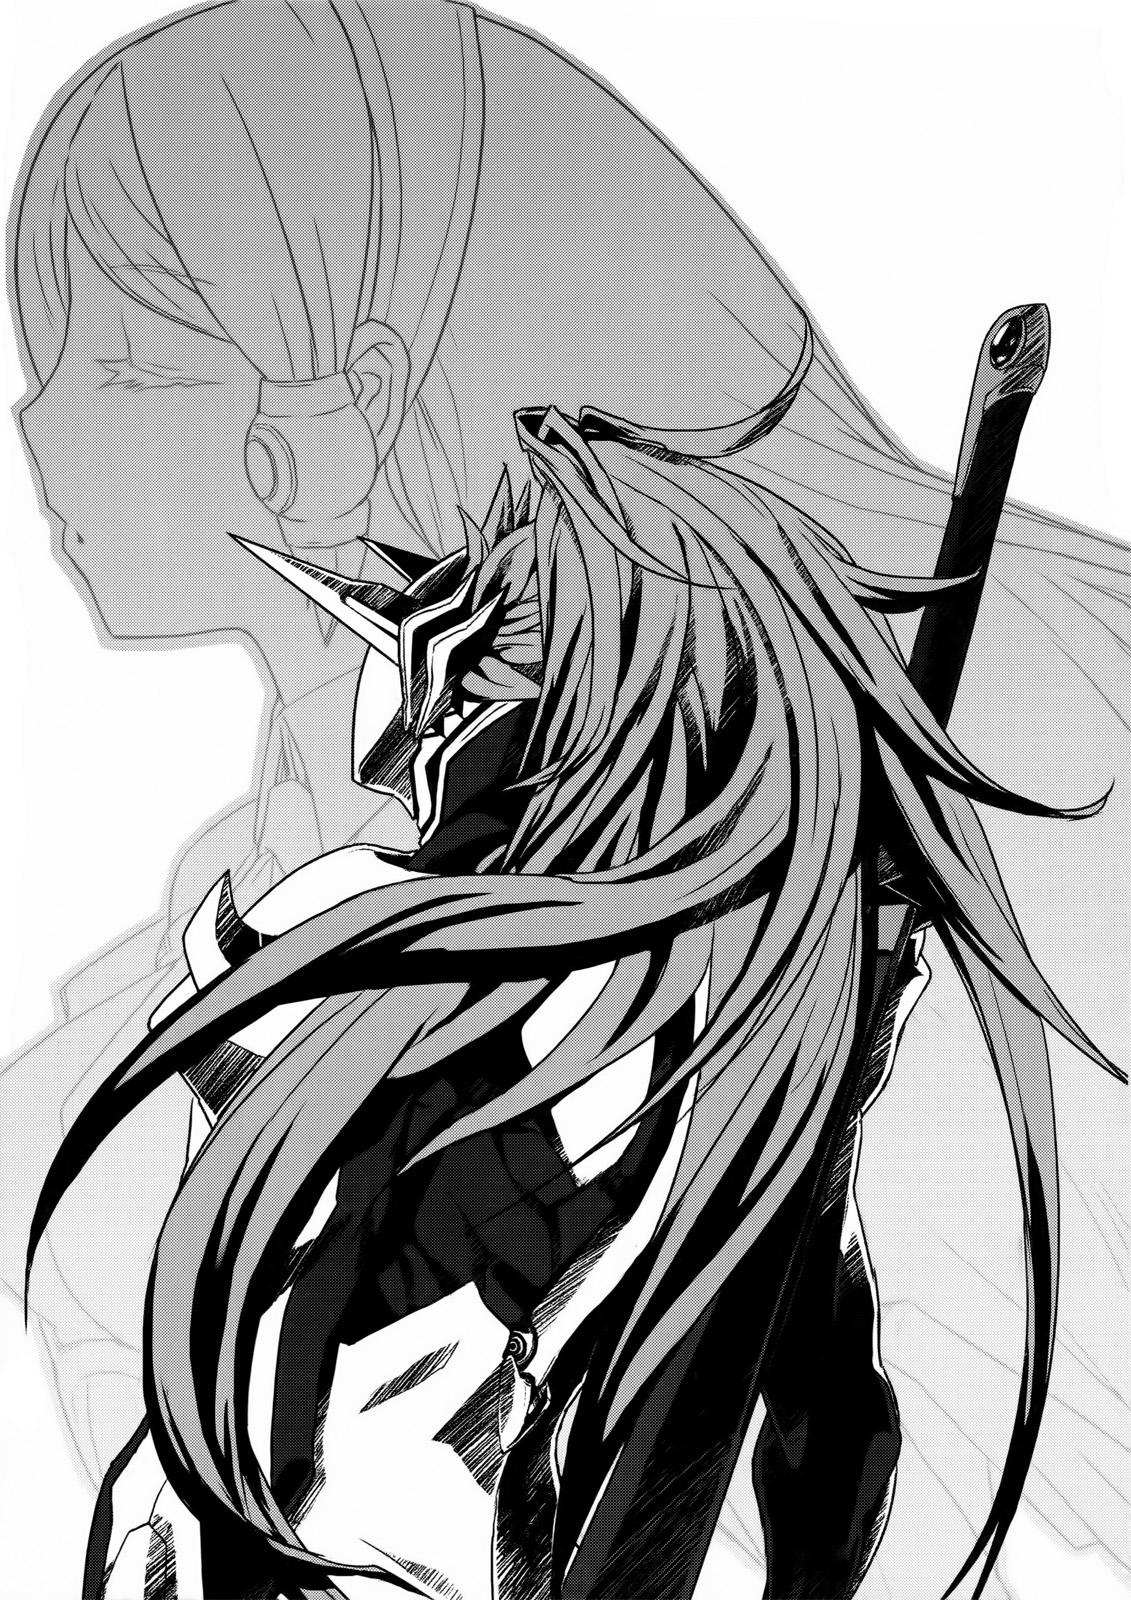 BlazBlue:Phase Shift 2 Chapter 4 - Baka-Tsuki